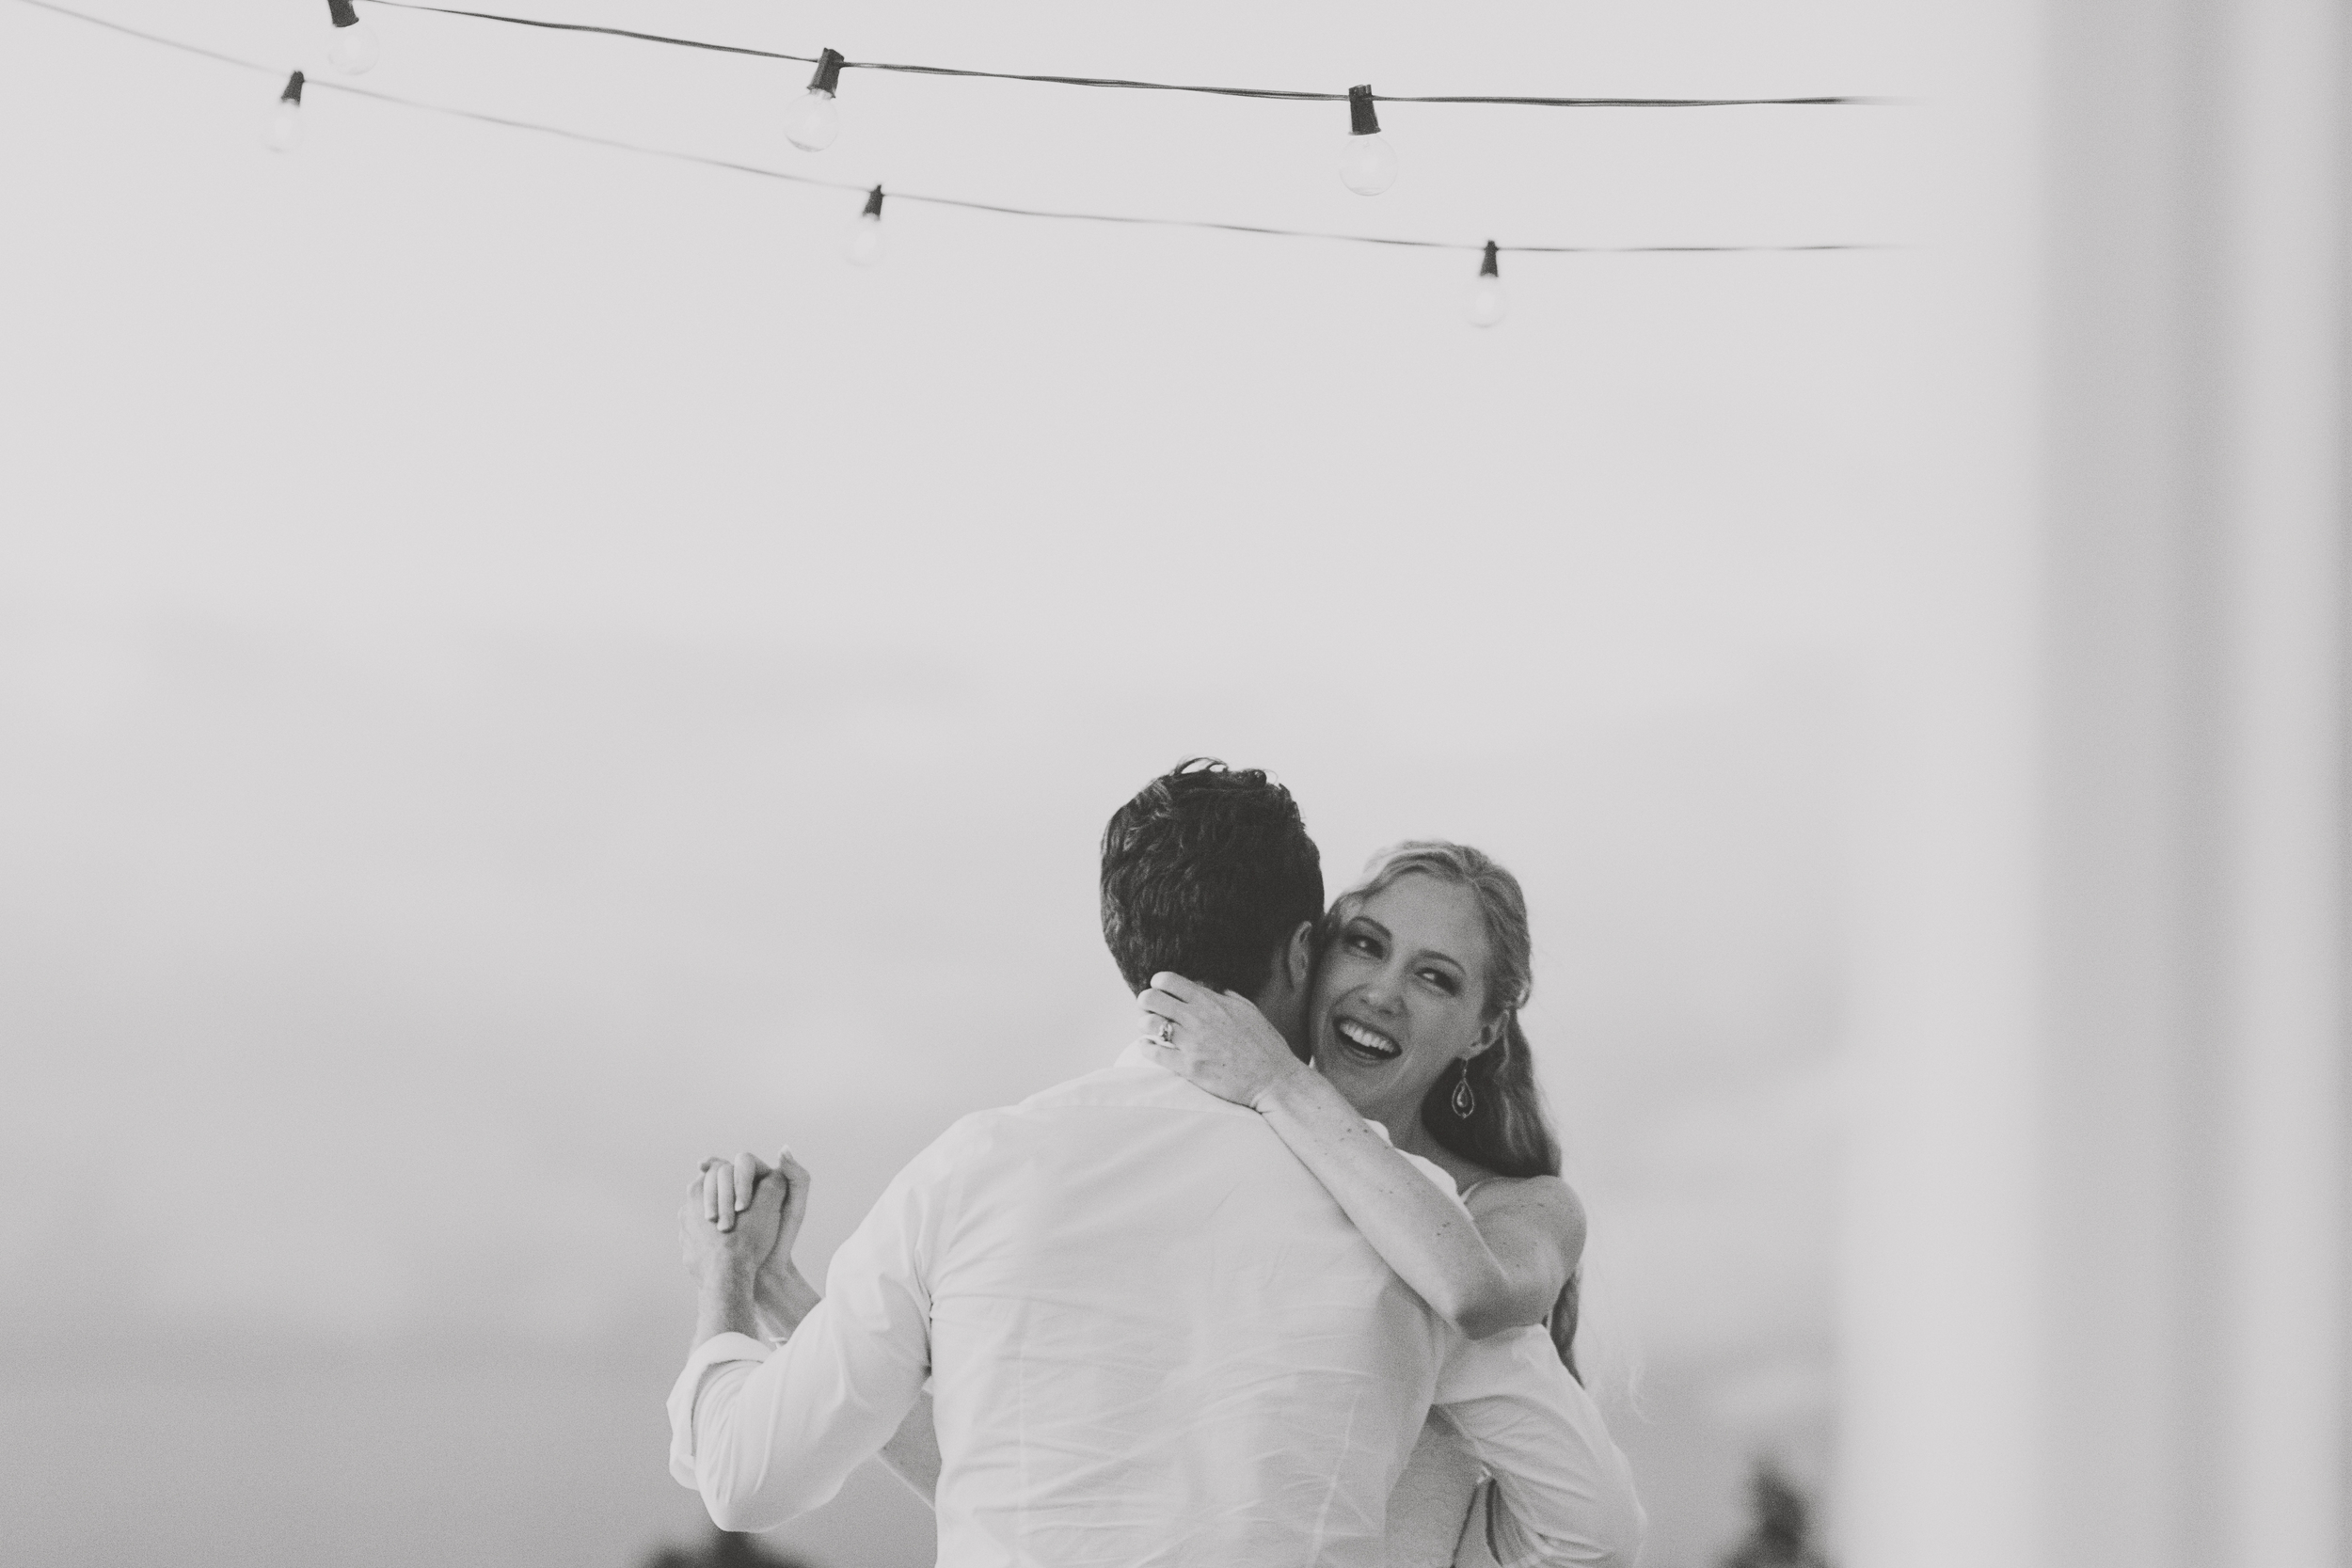 angie-diaz-photography-maui-wedding-115.jpg